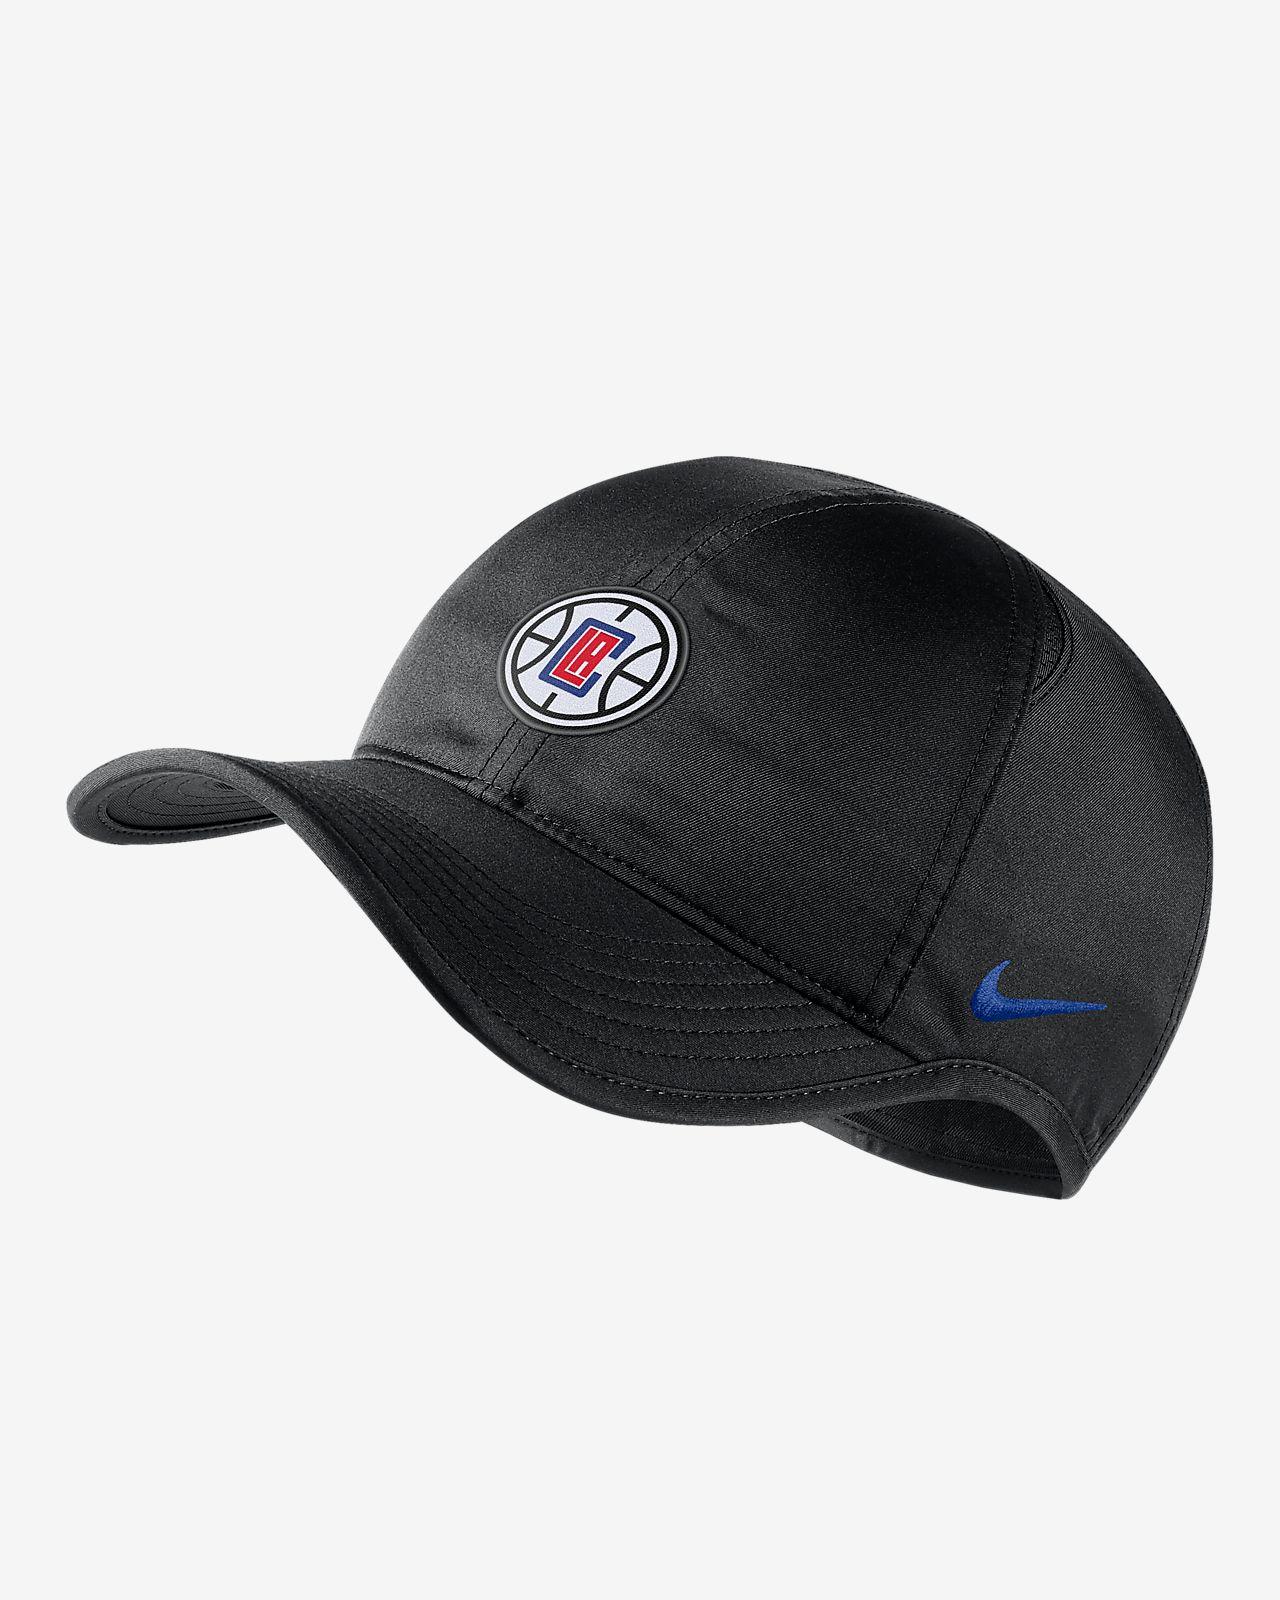 ed0af0fc5b4 LA Clippers Nike AeroBill Featherlight NBA Hat. Nike.com